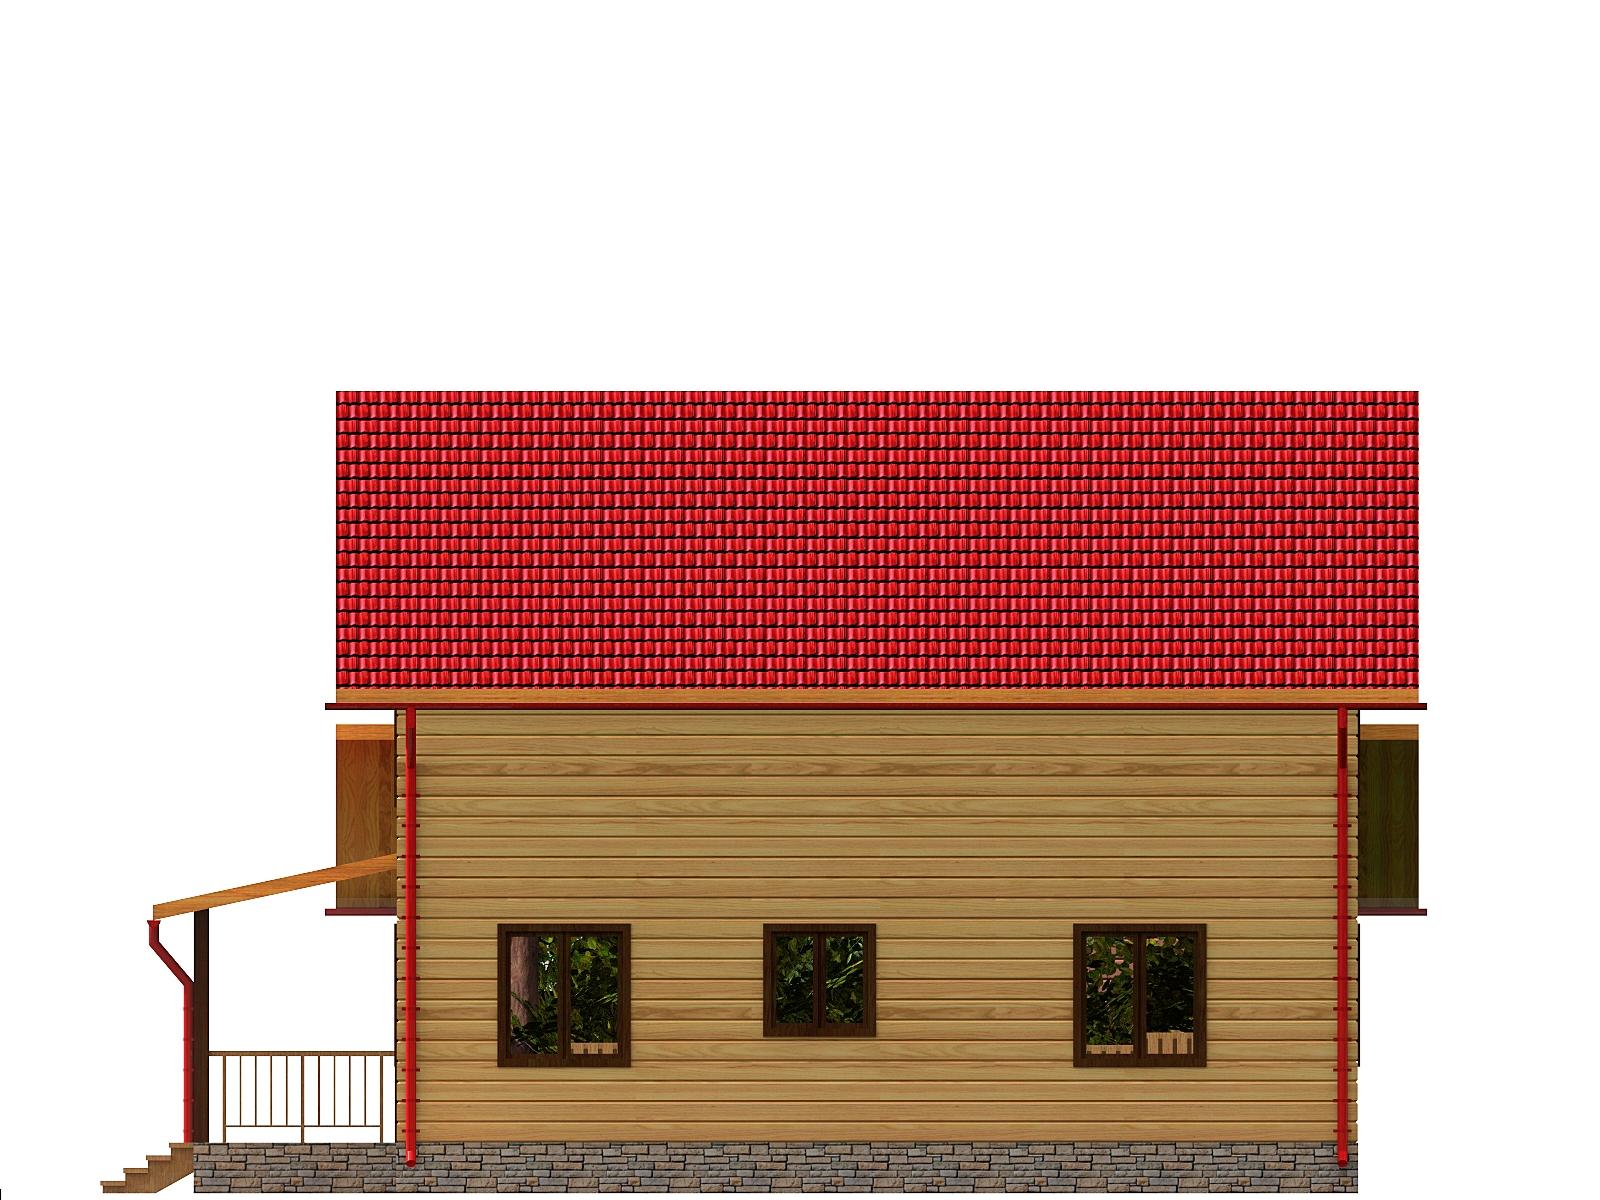 Проект дома из бруса 9,3х12,8 1,5 этажа с гаражом. Разрез 3.